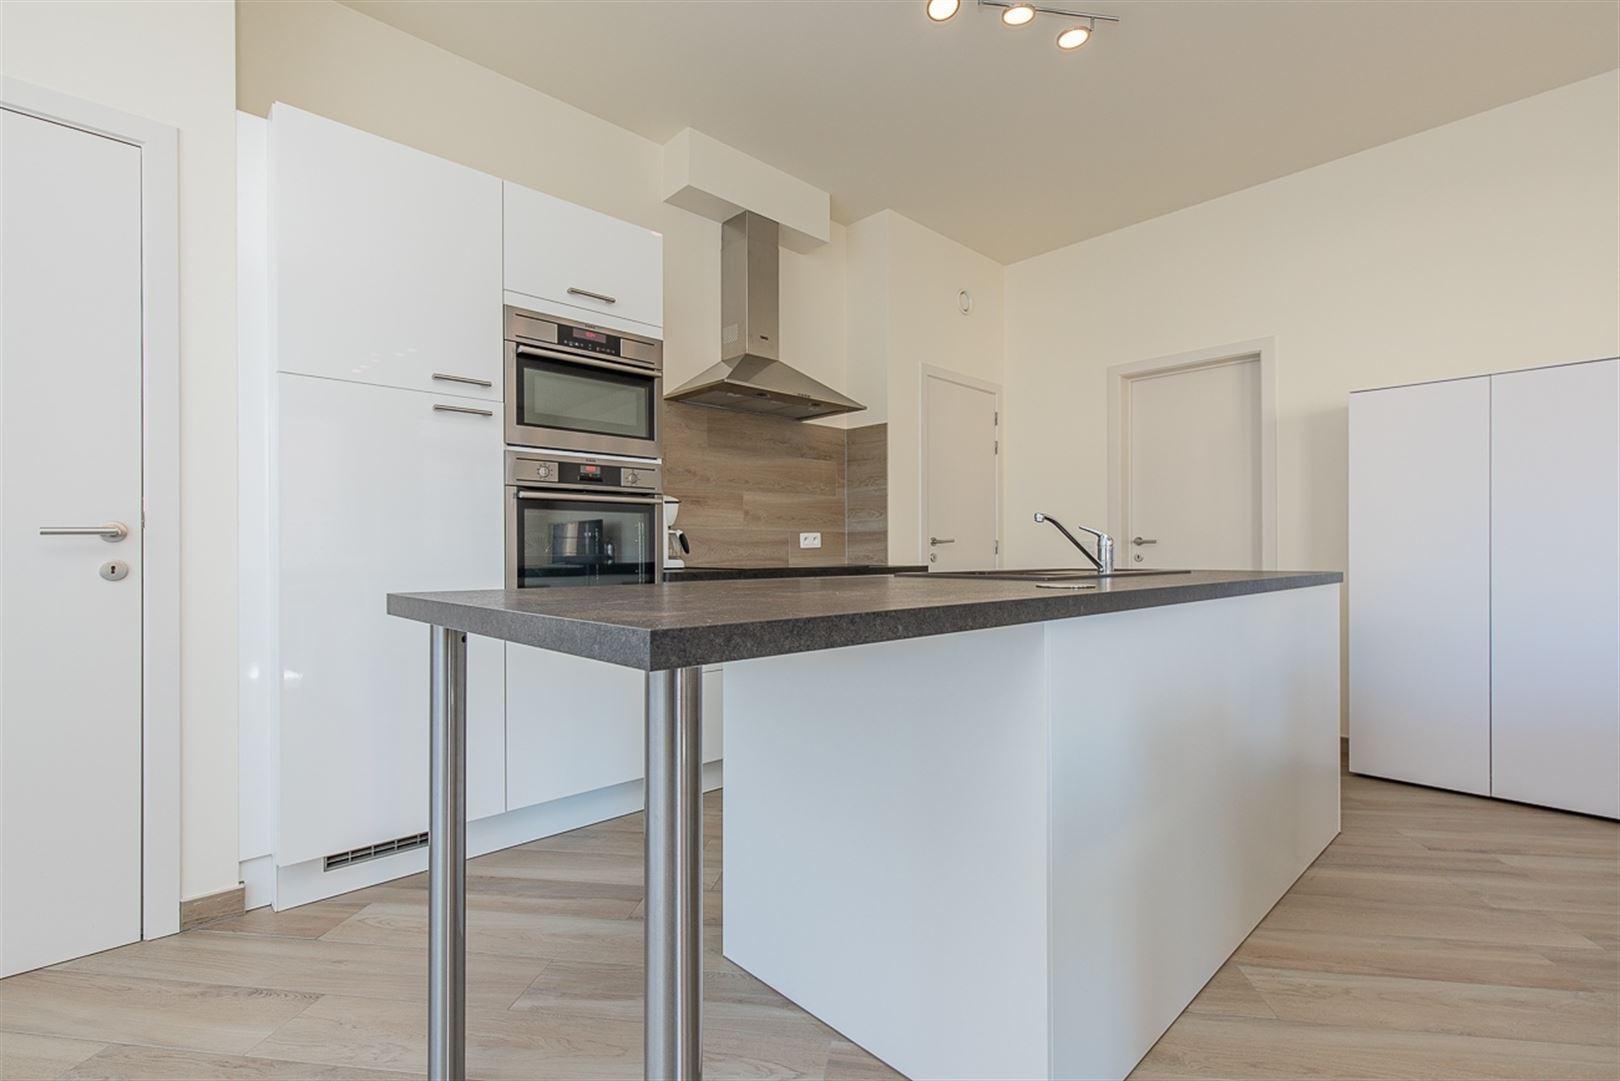 Foto 6 : Appartement te 9200 DENDERMONDE (België) - Prijs € 299.000